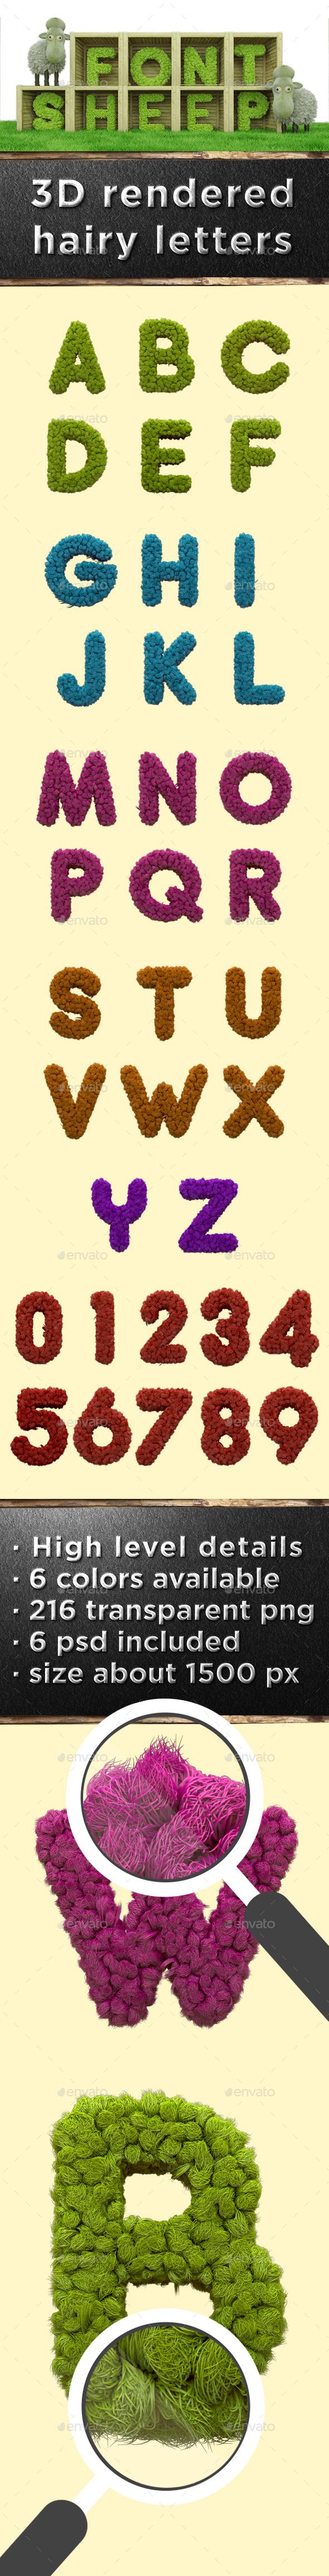 Sheep Font (6 PSD, 216 PNG) - Text 3D Renders